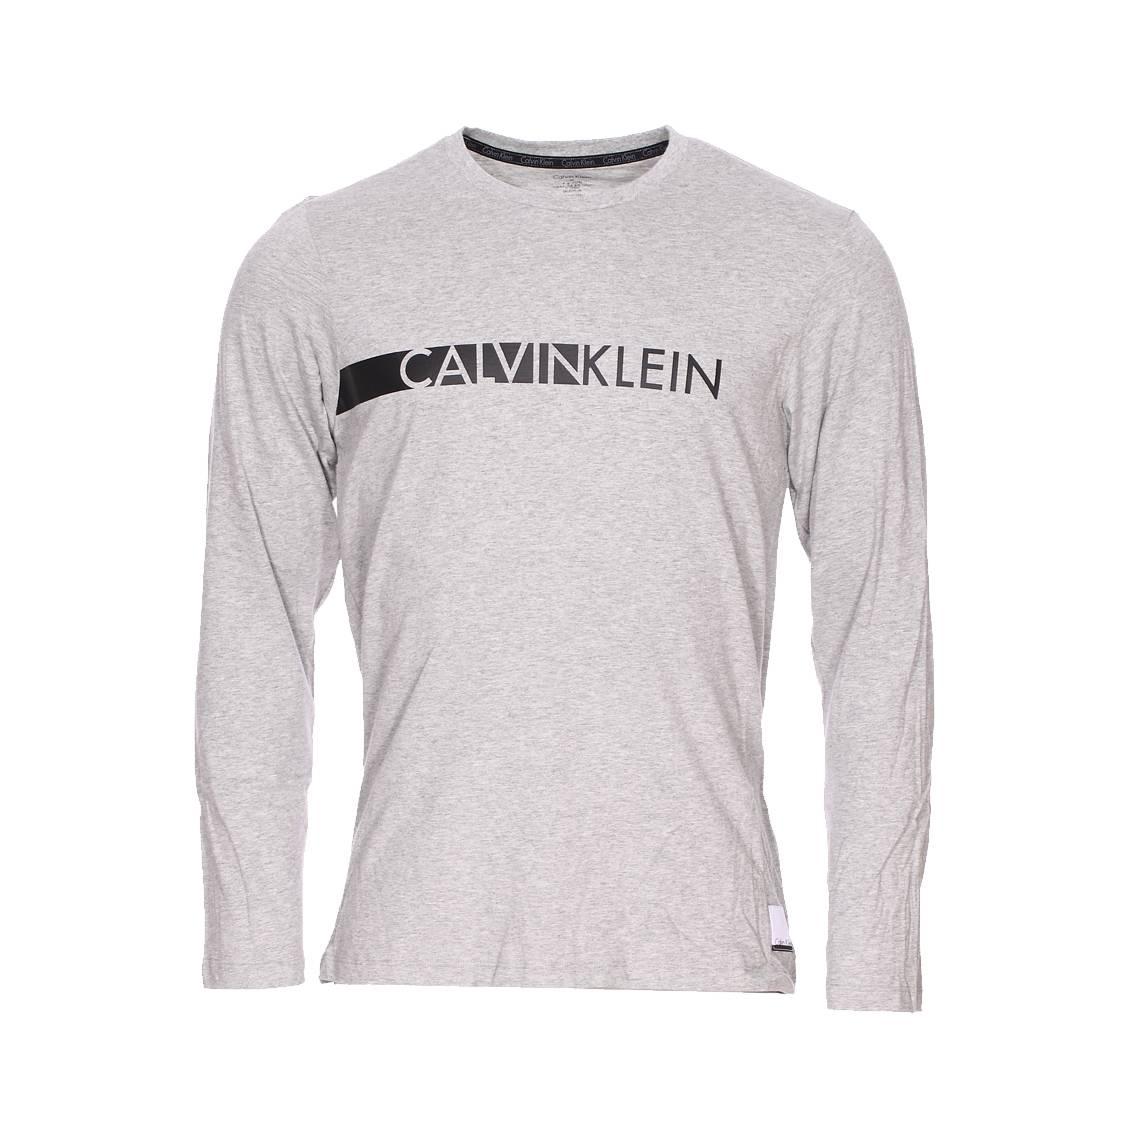 Tee-shirt manches longues calvin klein gris chiné floqué